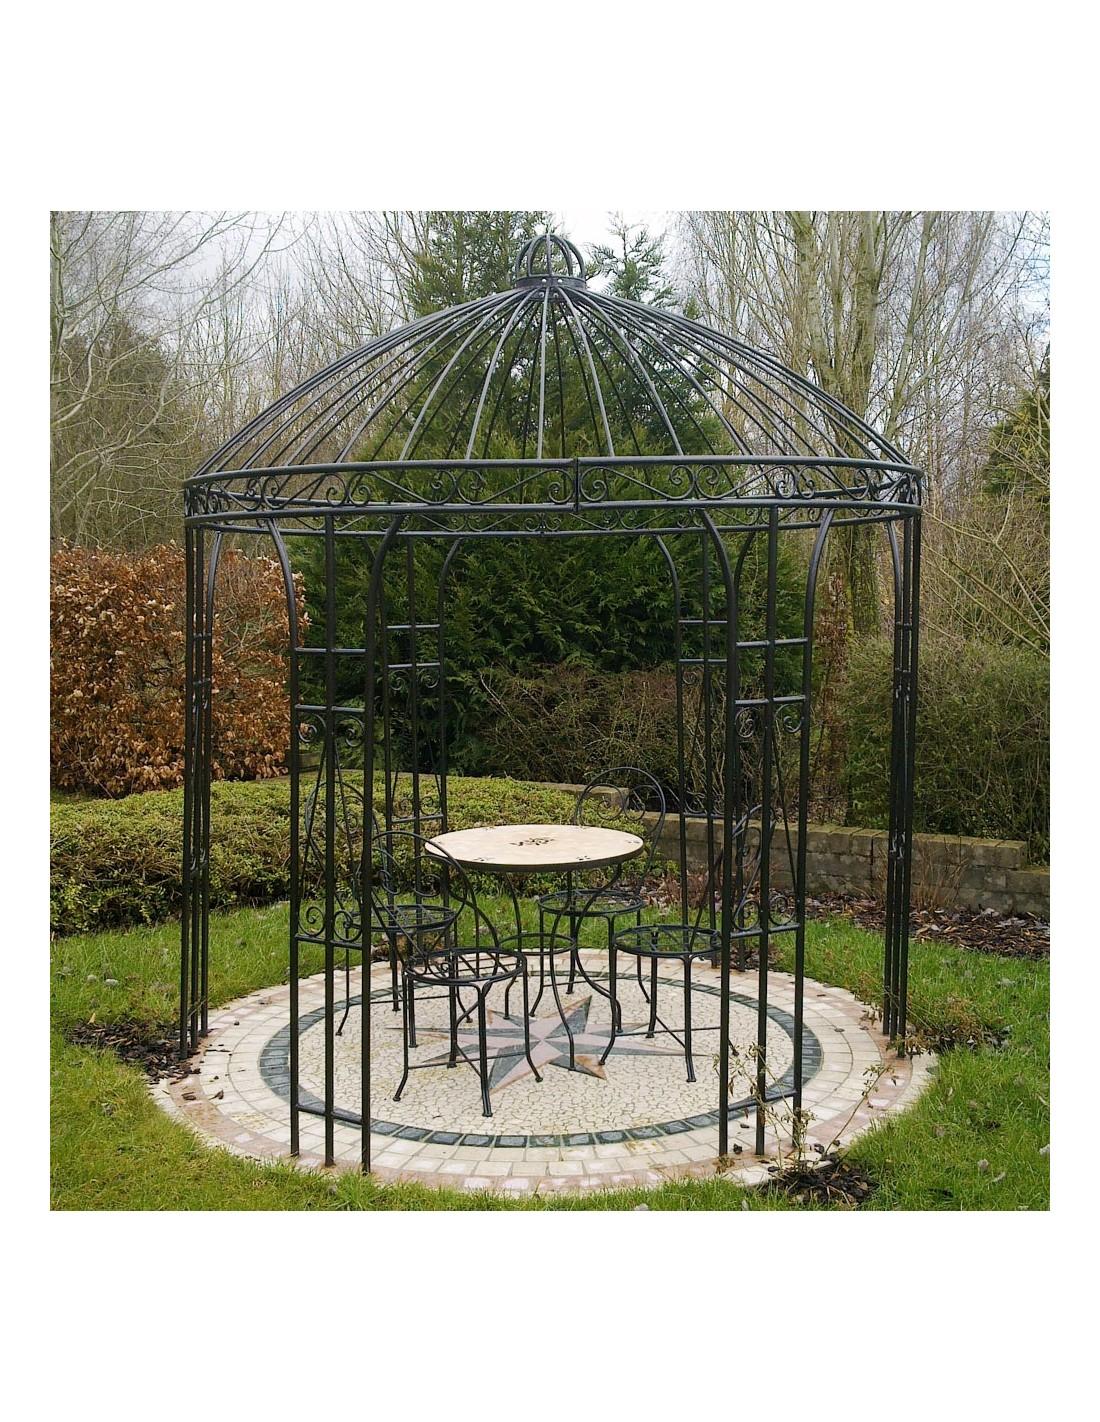 Gartenpavillon 260cm eisen albena marokko galerie for Gartenlaternen dekorieren